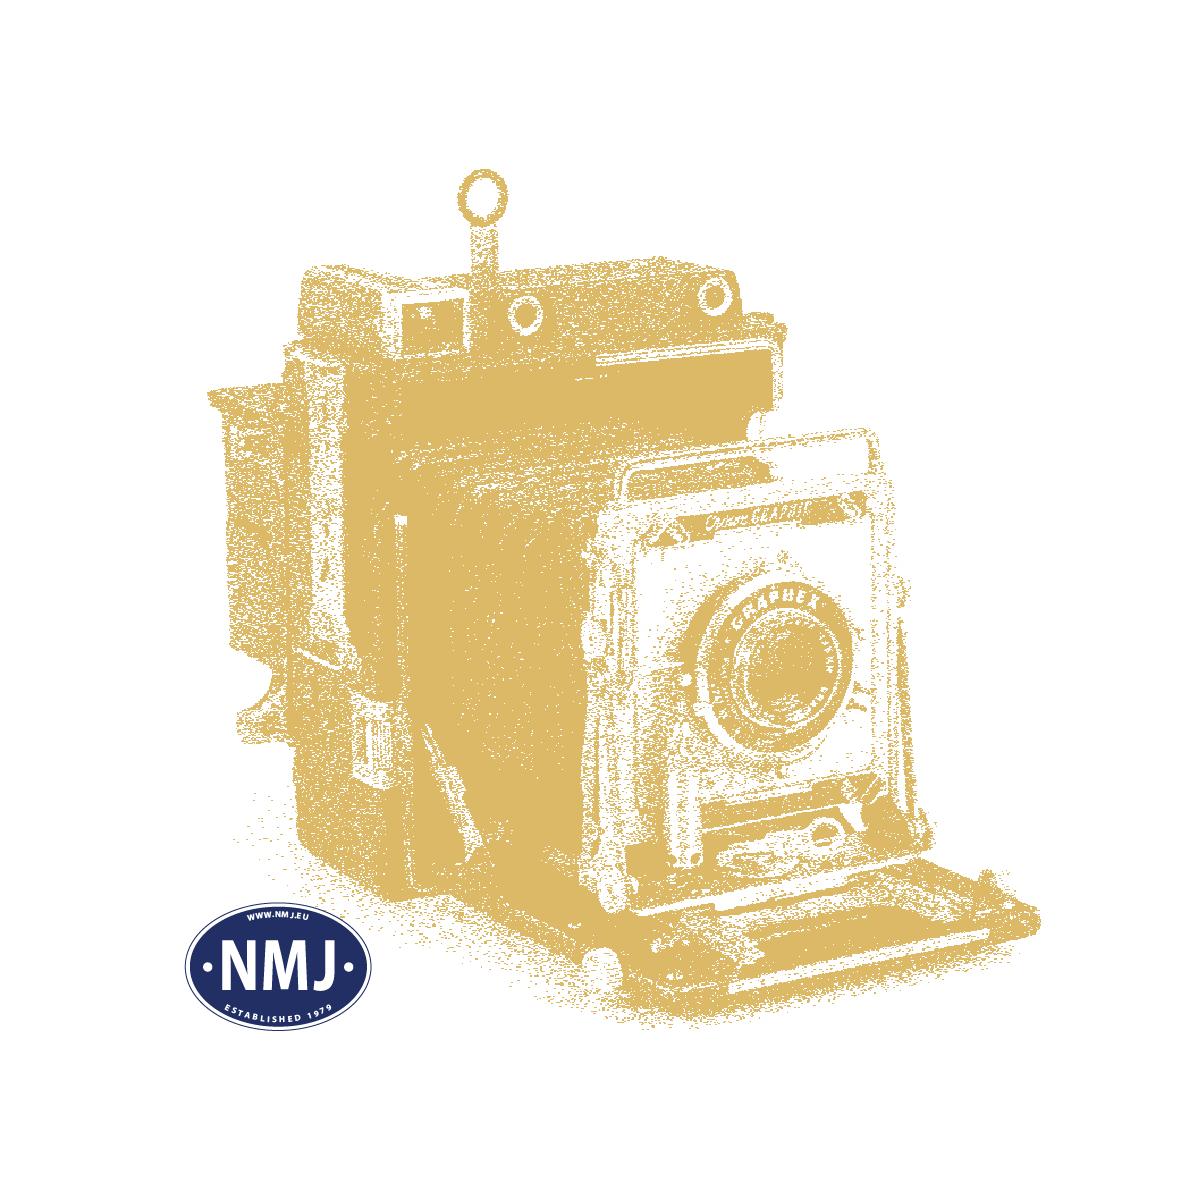 NMJST316492 - NMJ Superline NSB T3 16492 Stakevogn m/ Bremseplattform